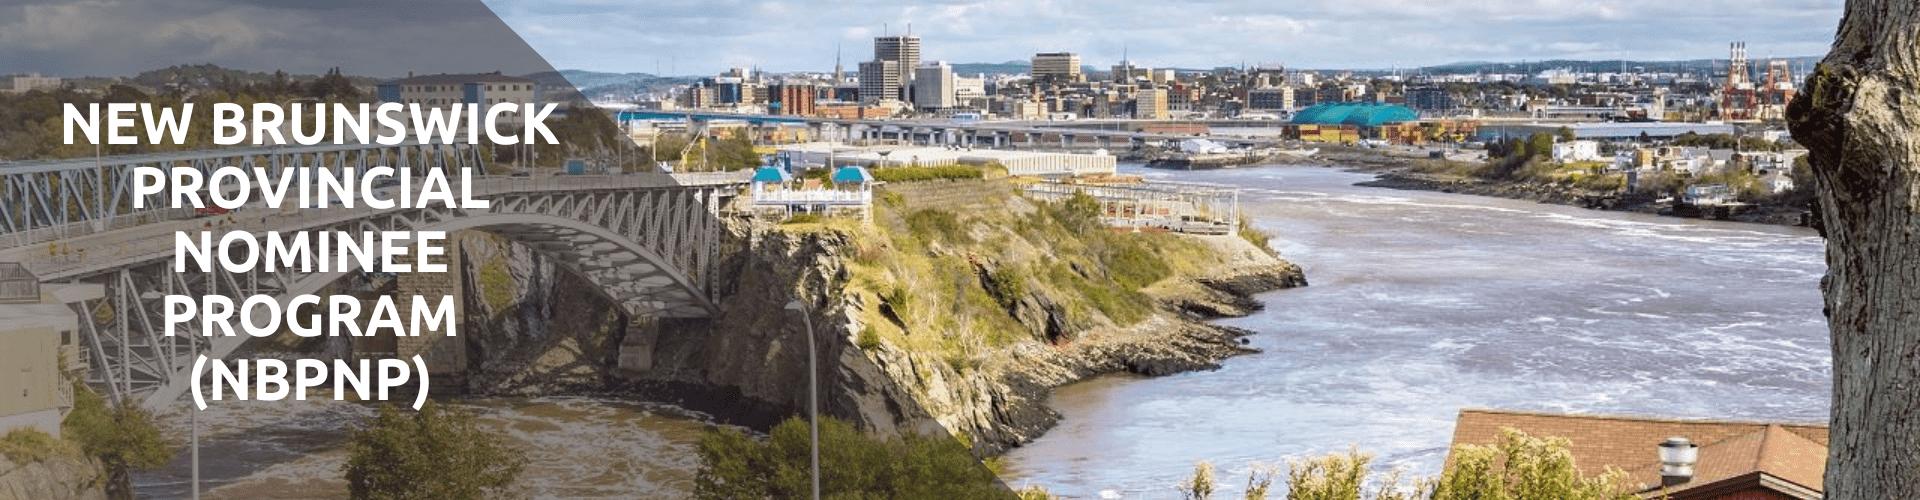 New Brunswick Provincial Nominee Program (NBPNP)